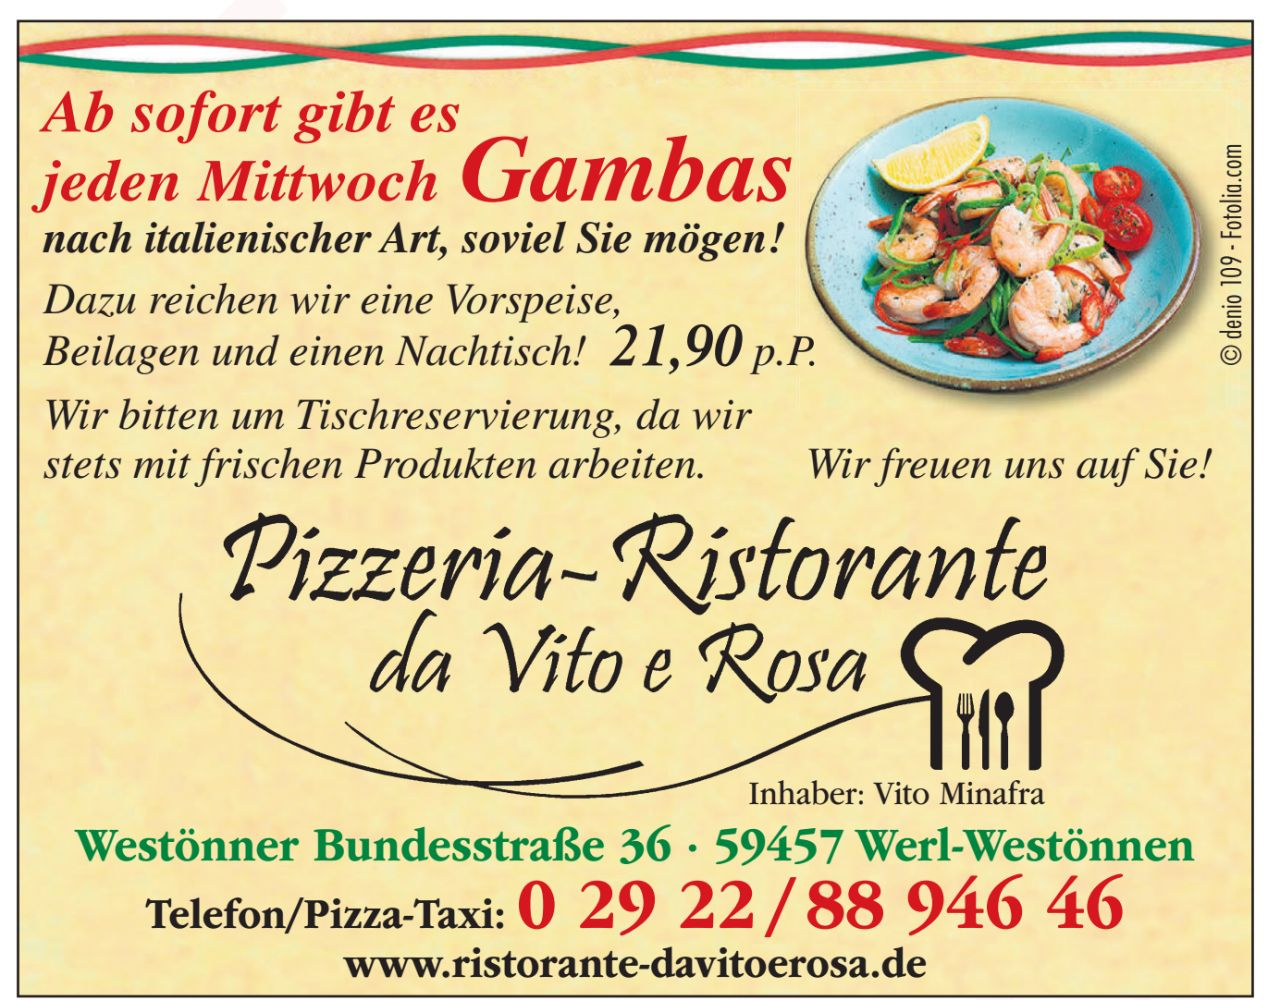 Gammas Aktion Resorante Da Vito E Rosa